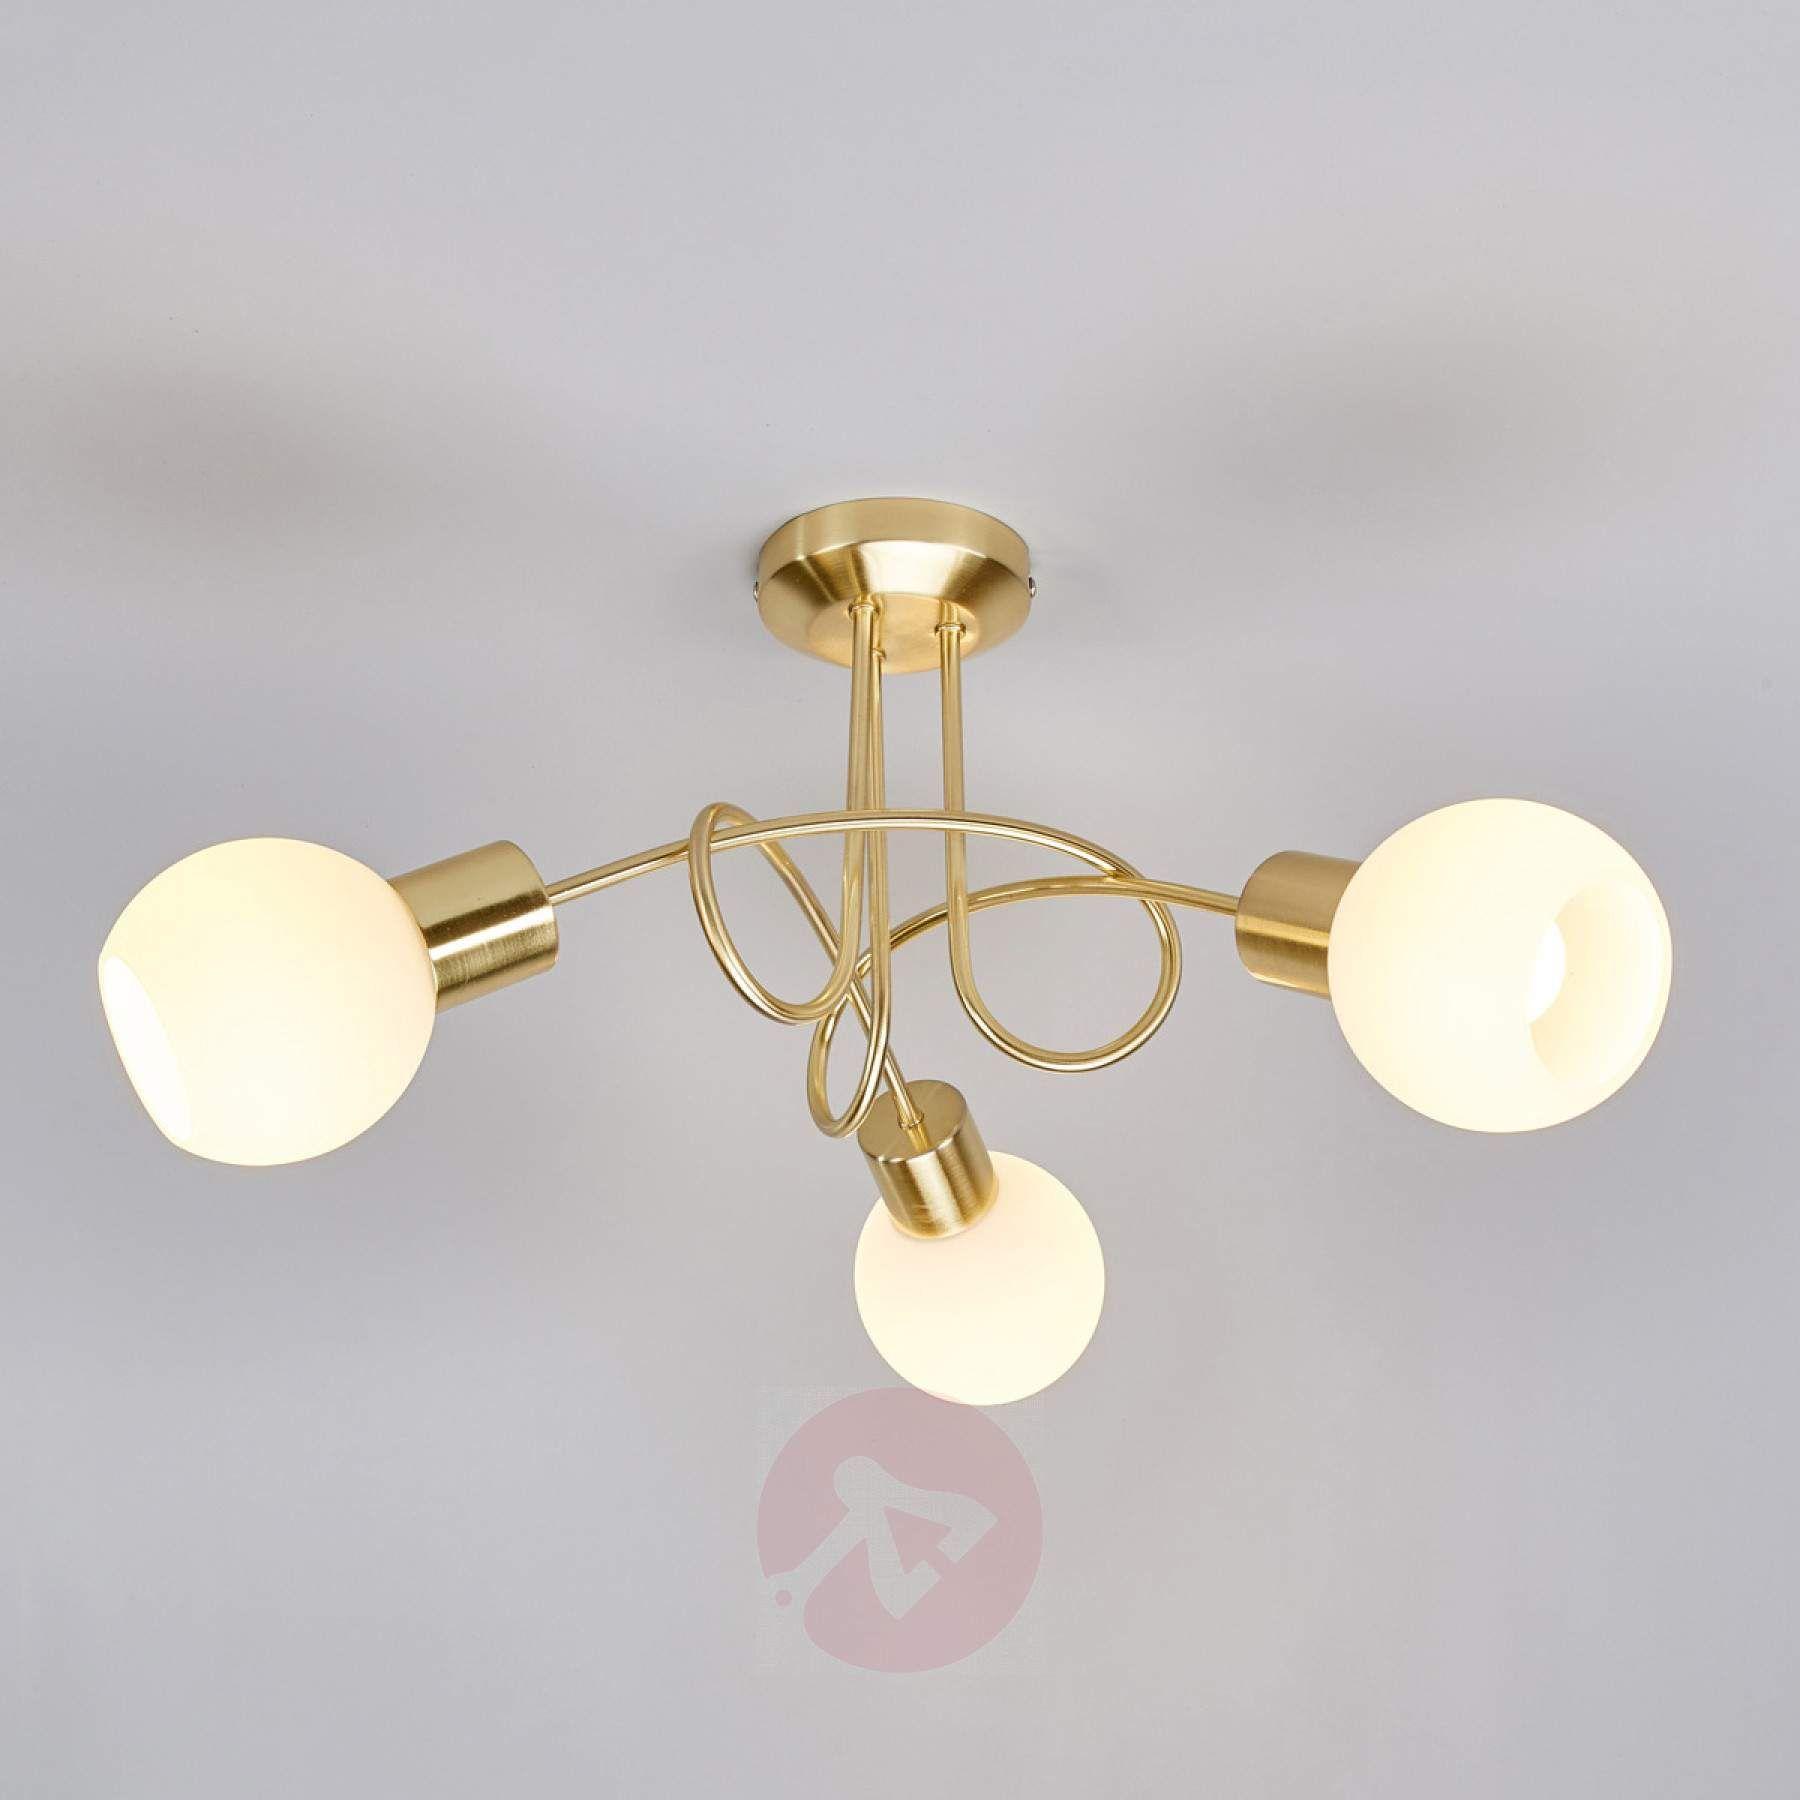 Brass Coloured Led Ceiling Light Elaina 3 Bulb Ceiling Lights Led Ceiling Lights Led Ceiling